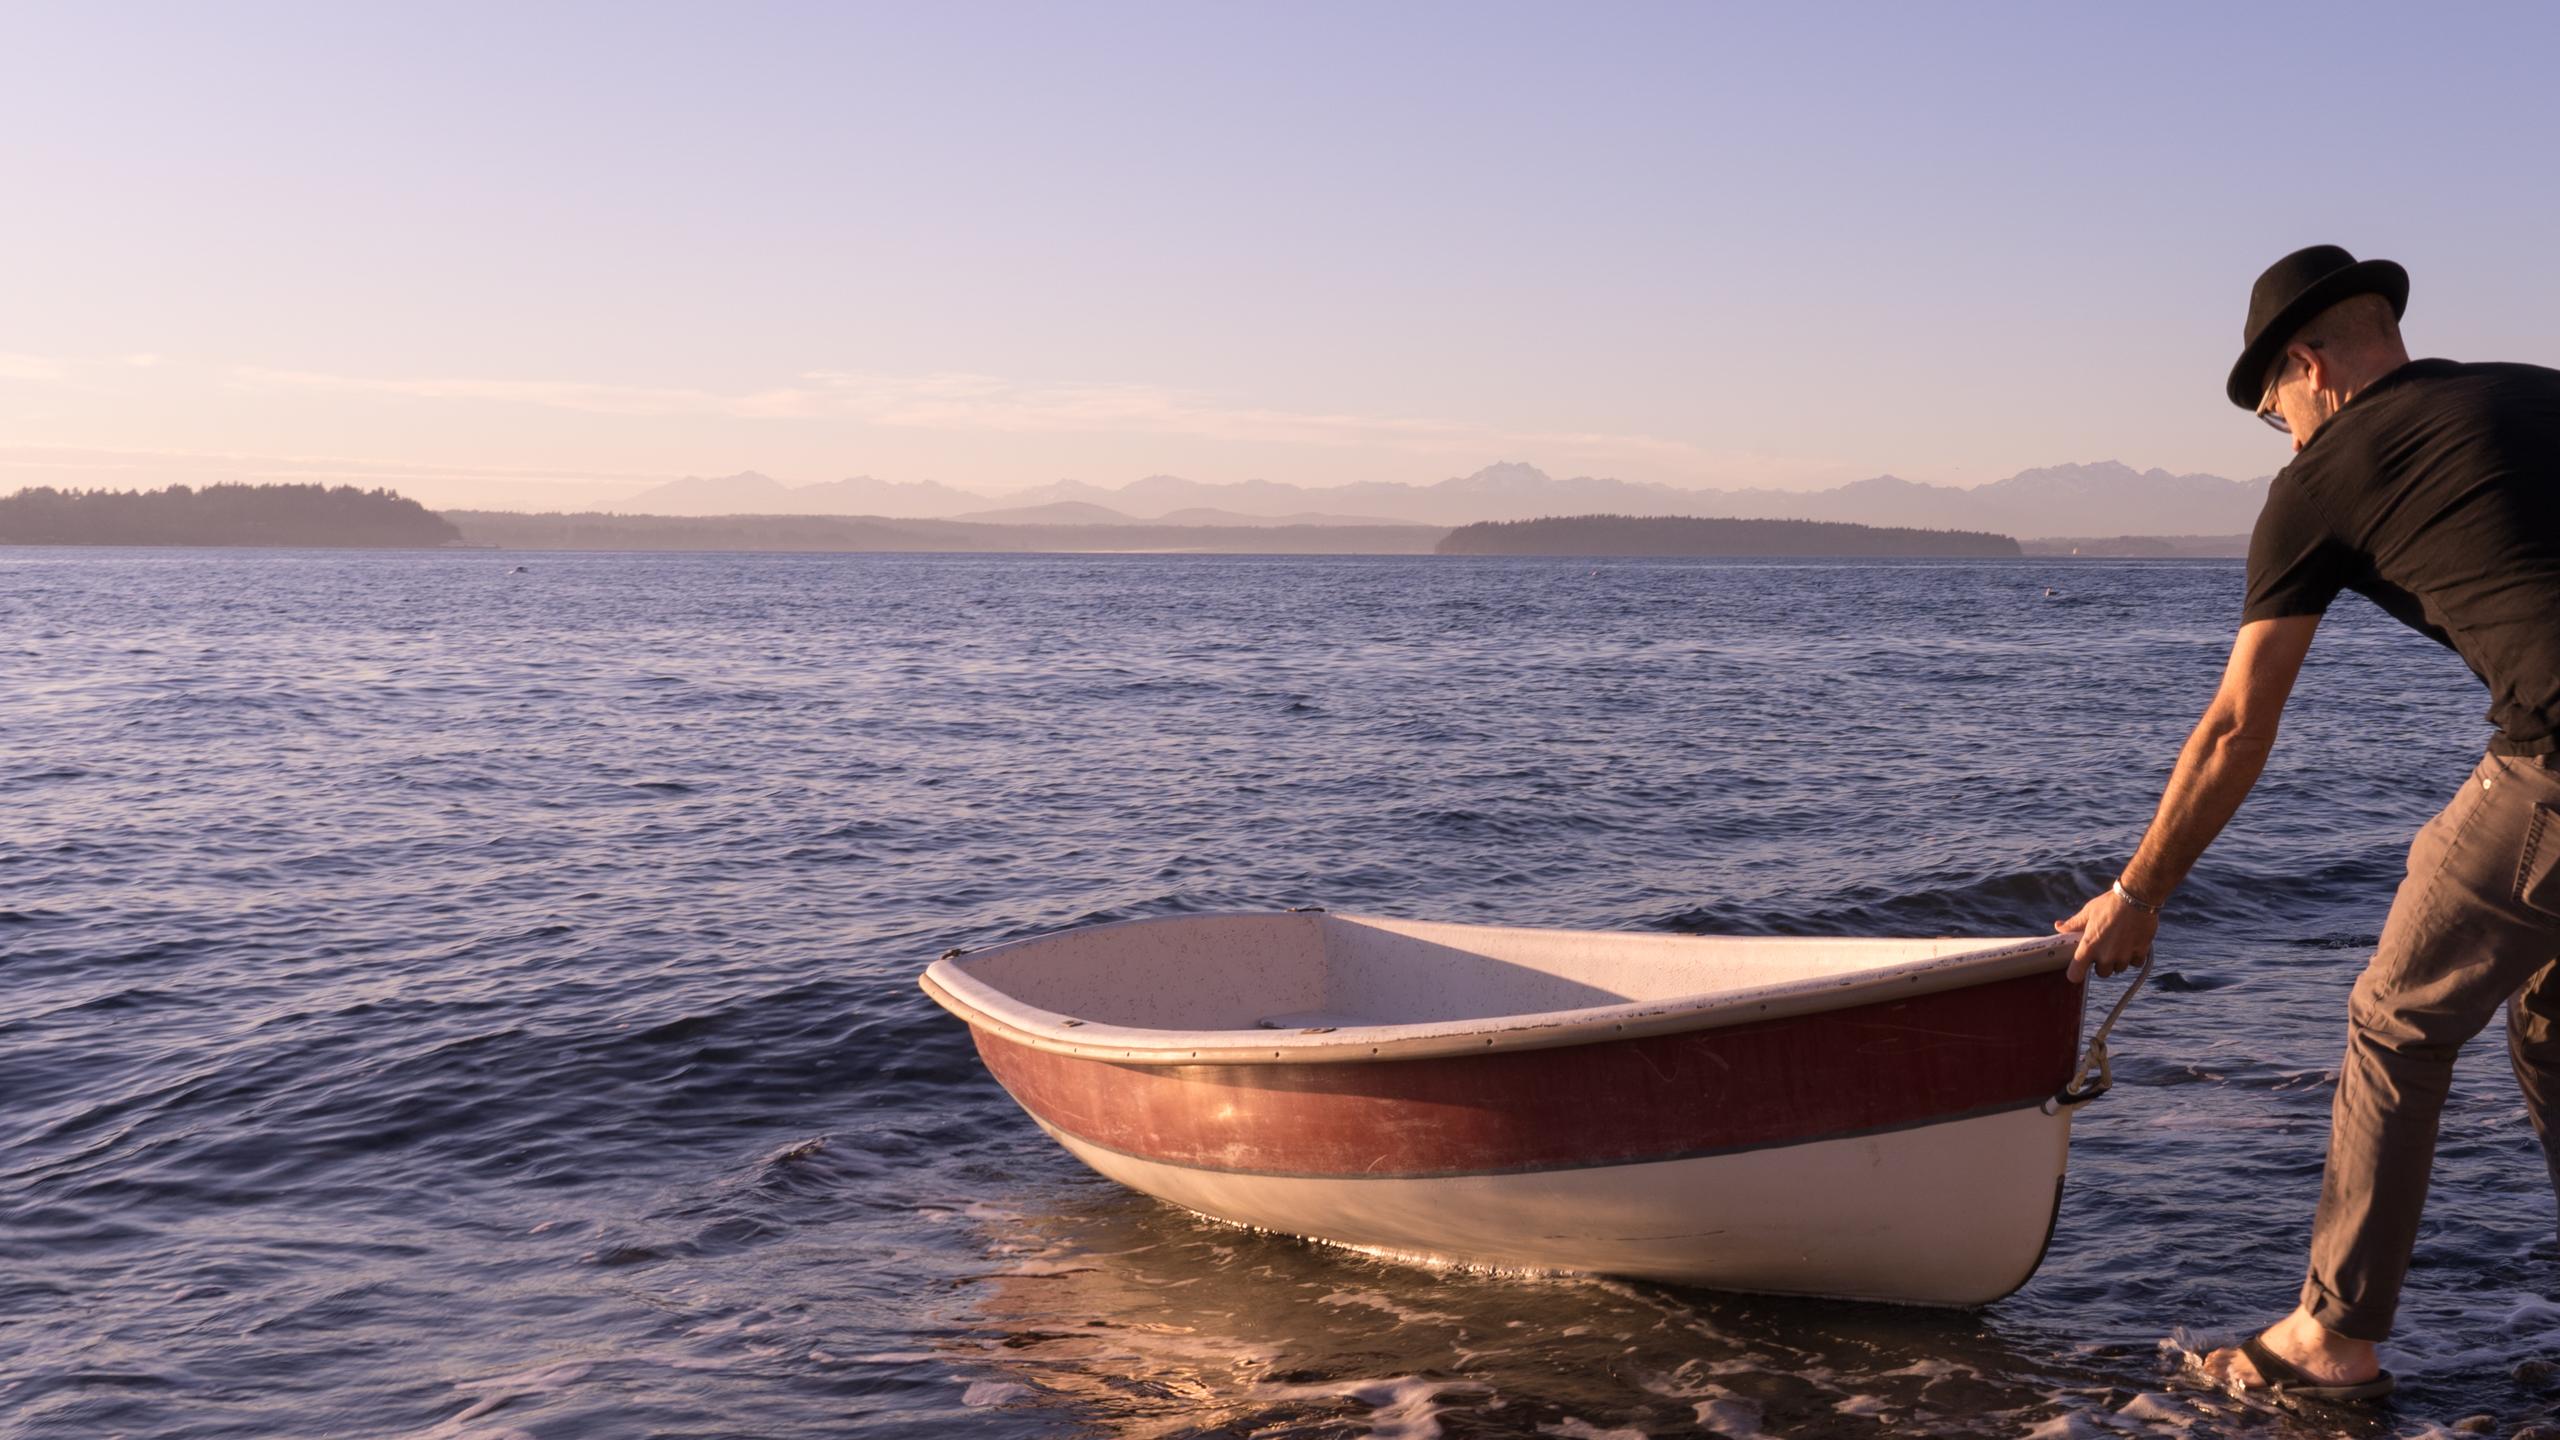 Trevor Ras launching row boat